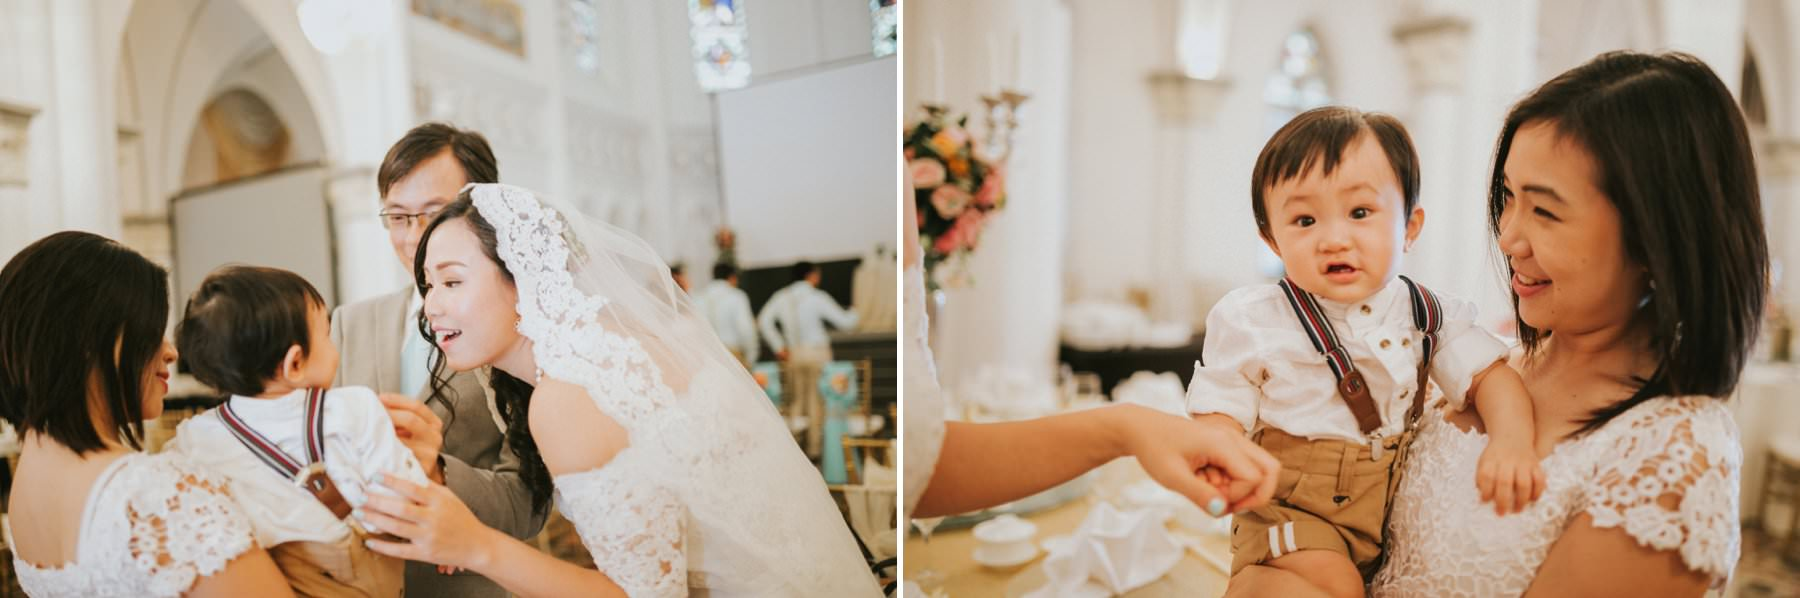 Singapore_Chijmes_Hall_Wedding_0078